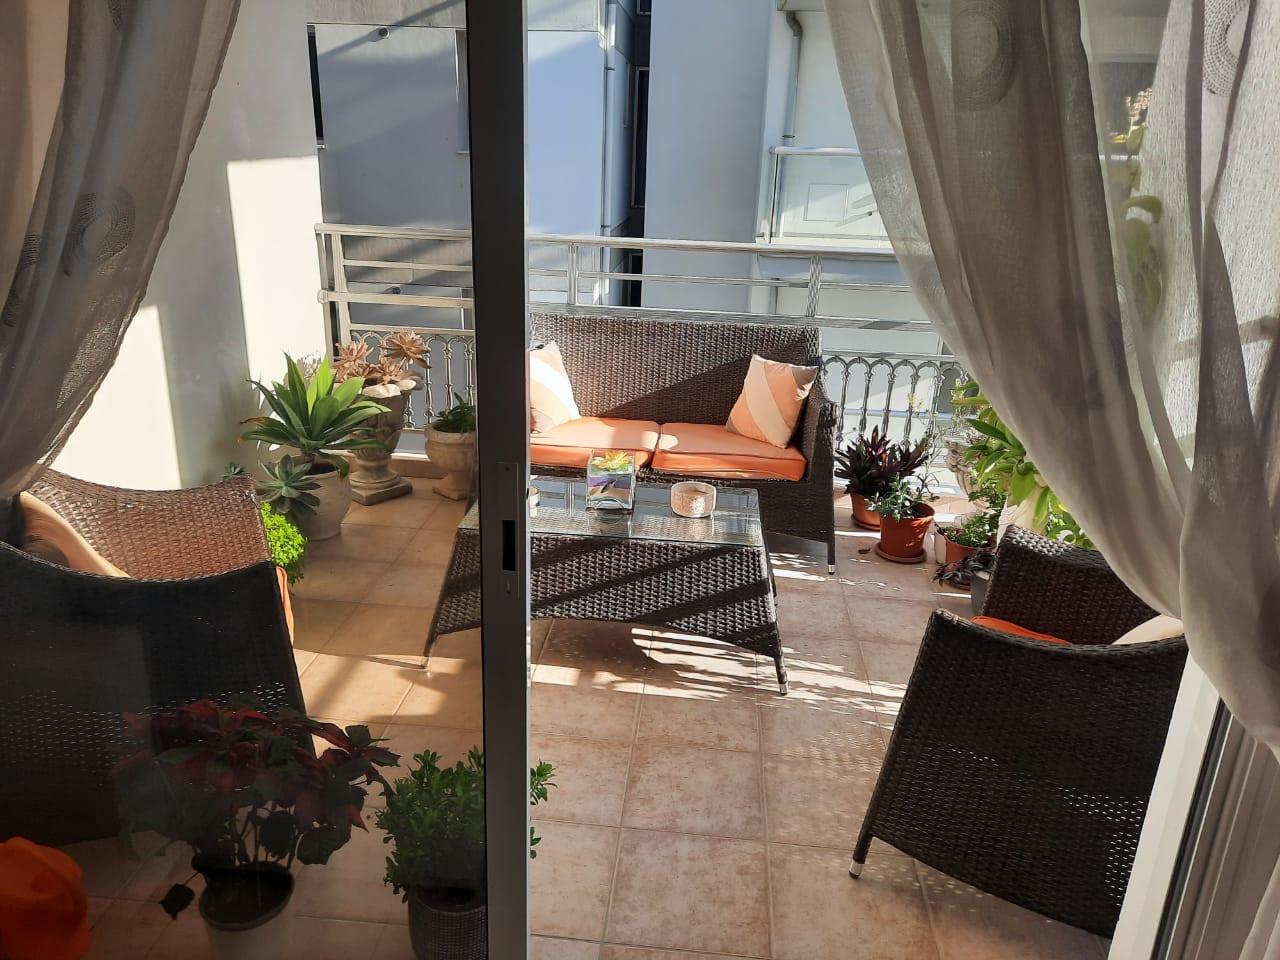 FC-33497: Apartment (Flat) in Mackenzie, Larnaca for Sale - #4